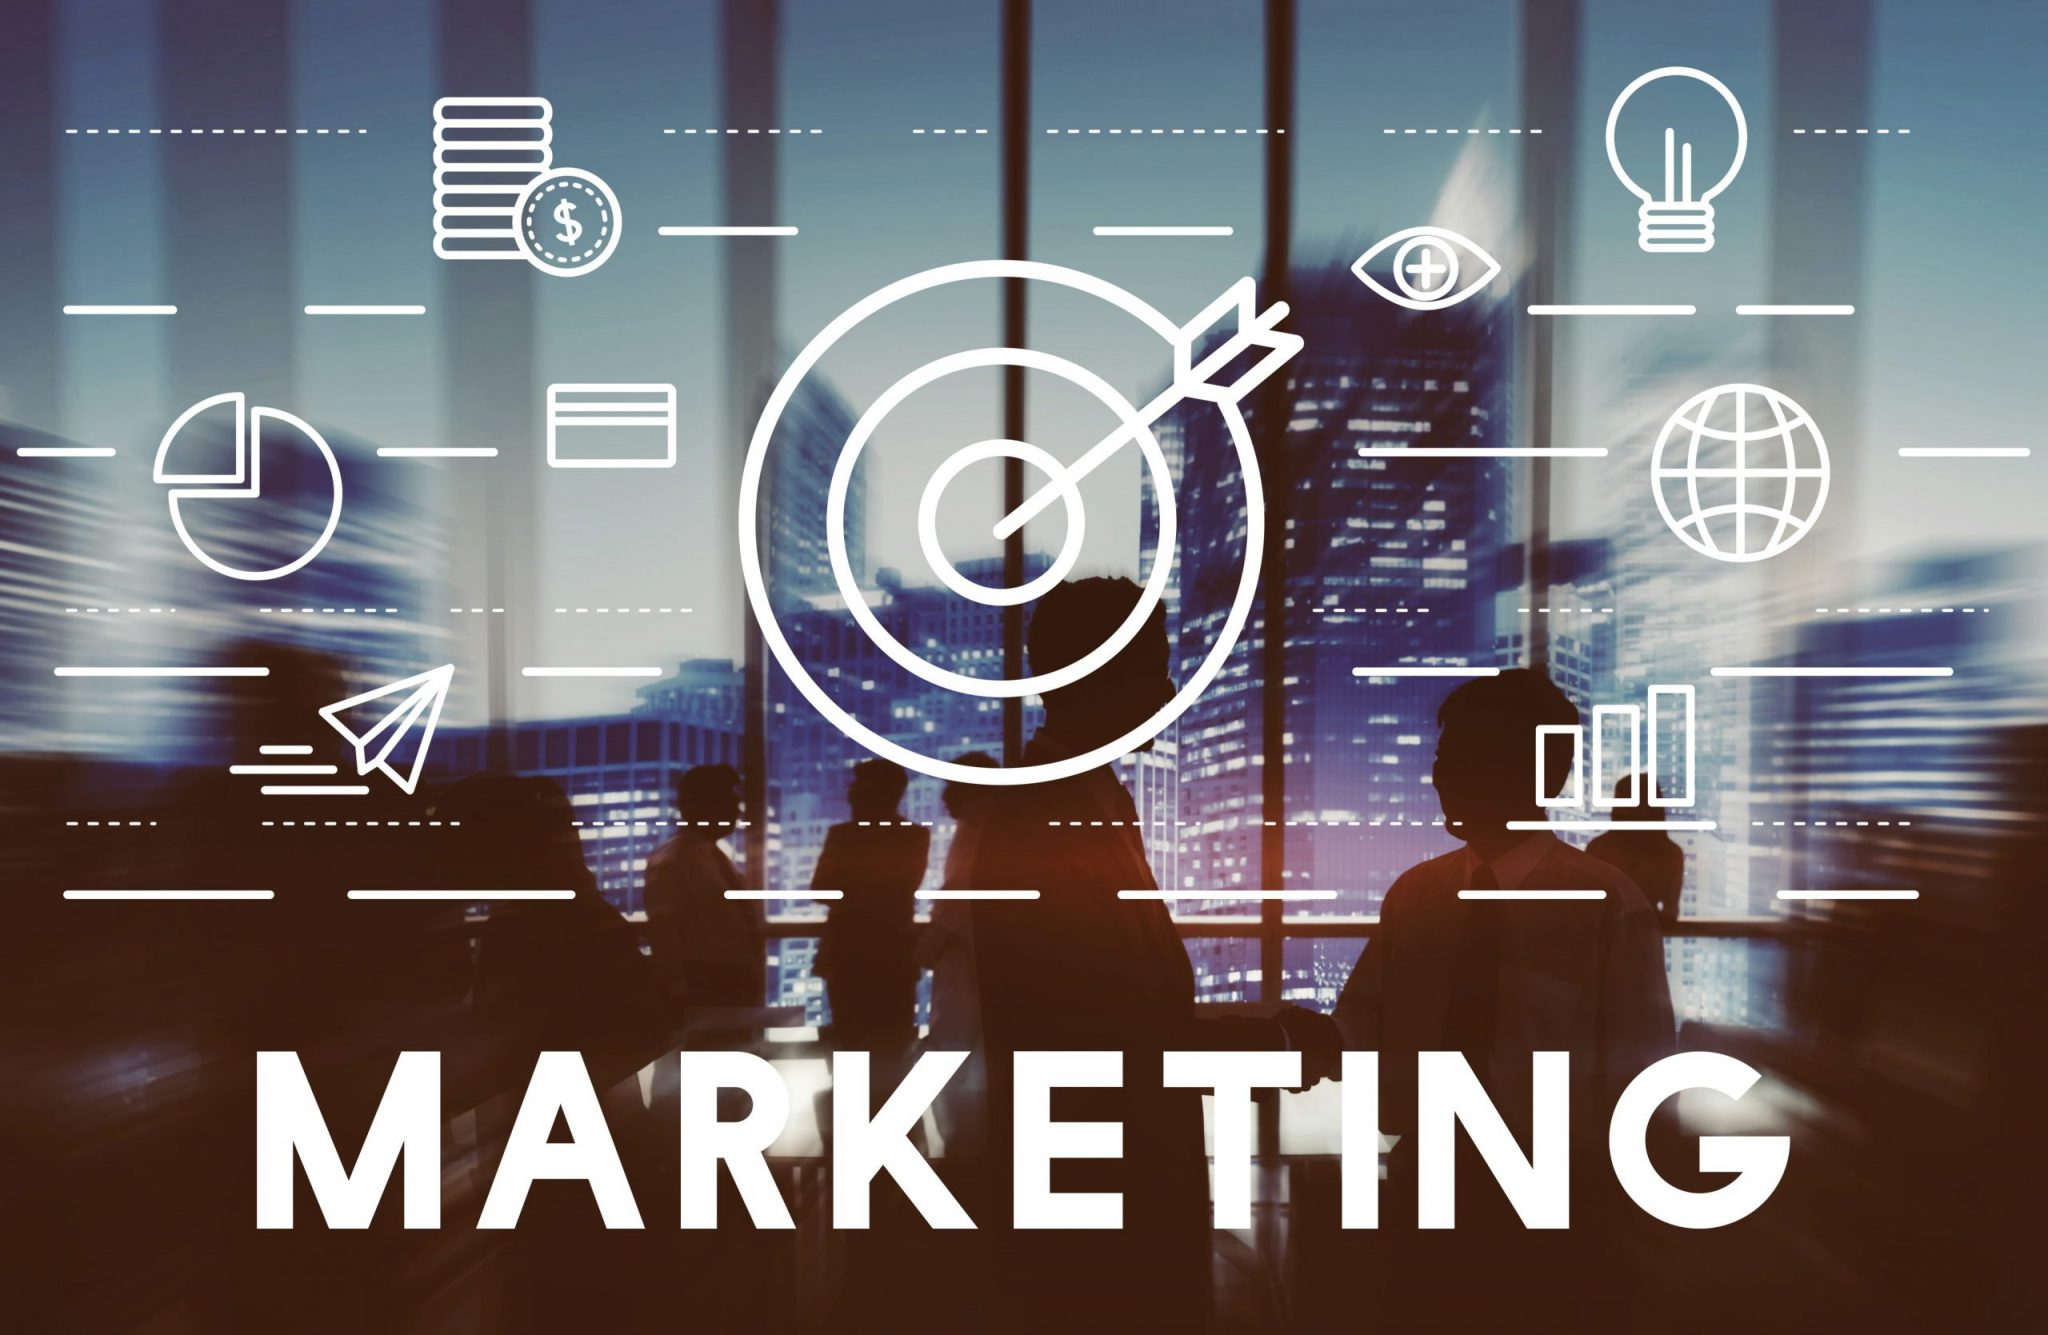 مدرک دیجیتال مارکتینگ